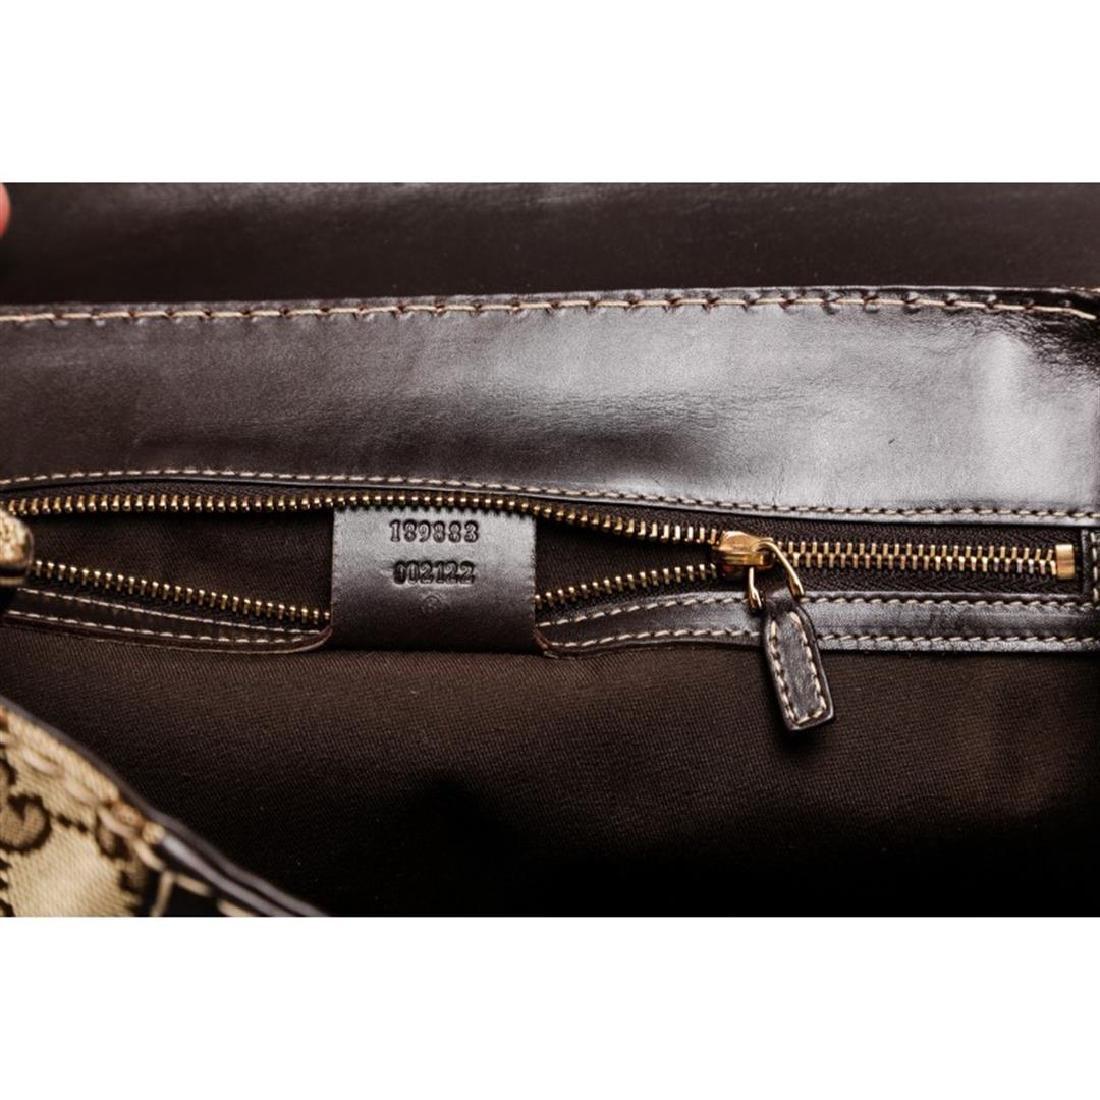 Gucci Beige Canvas Monogram Brown Leather Dialux Queen - 9